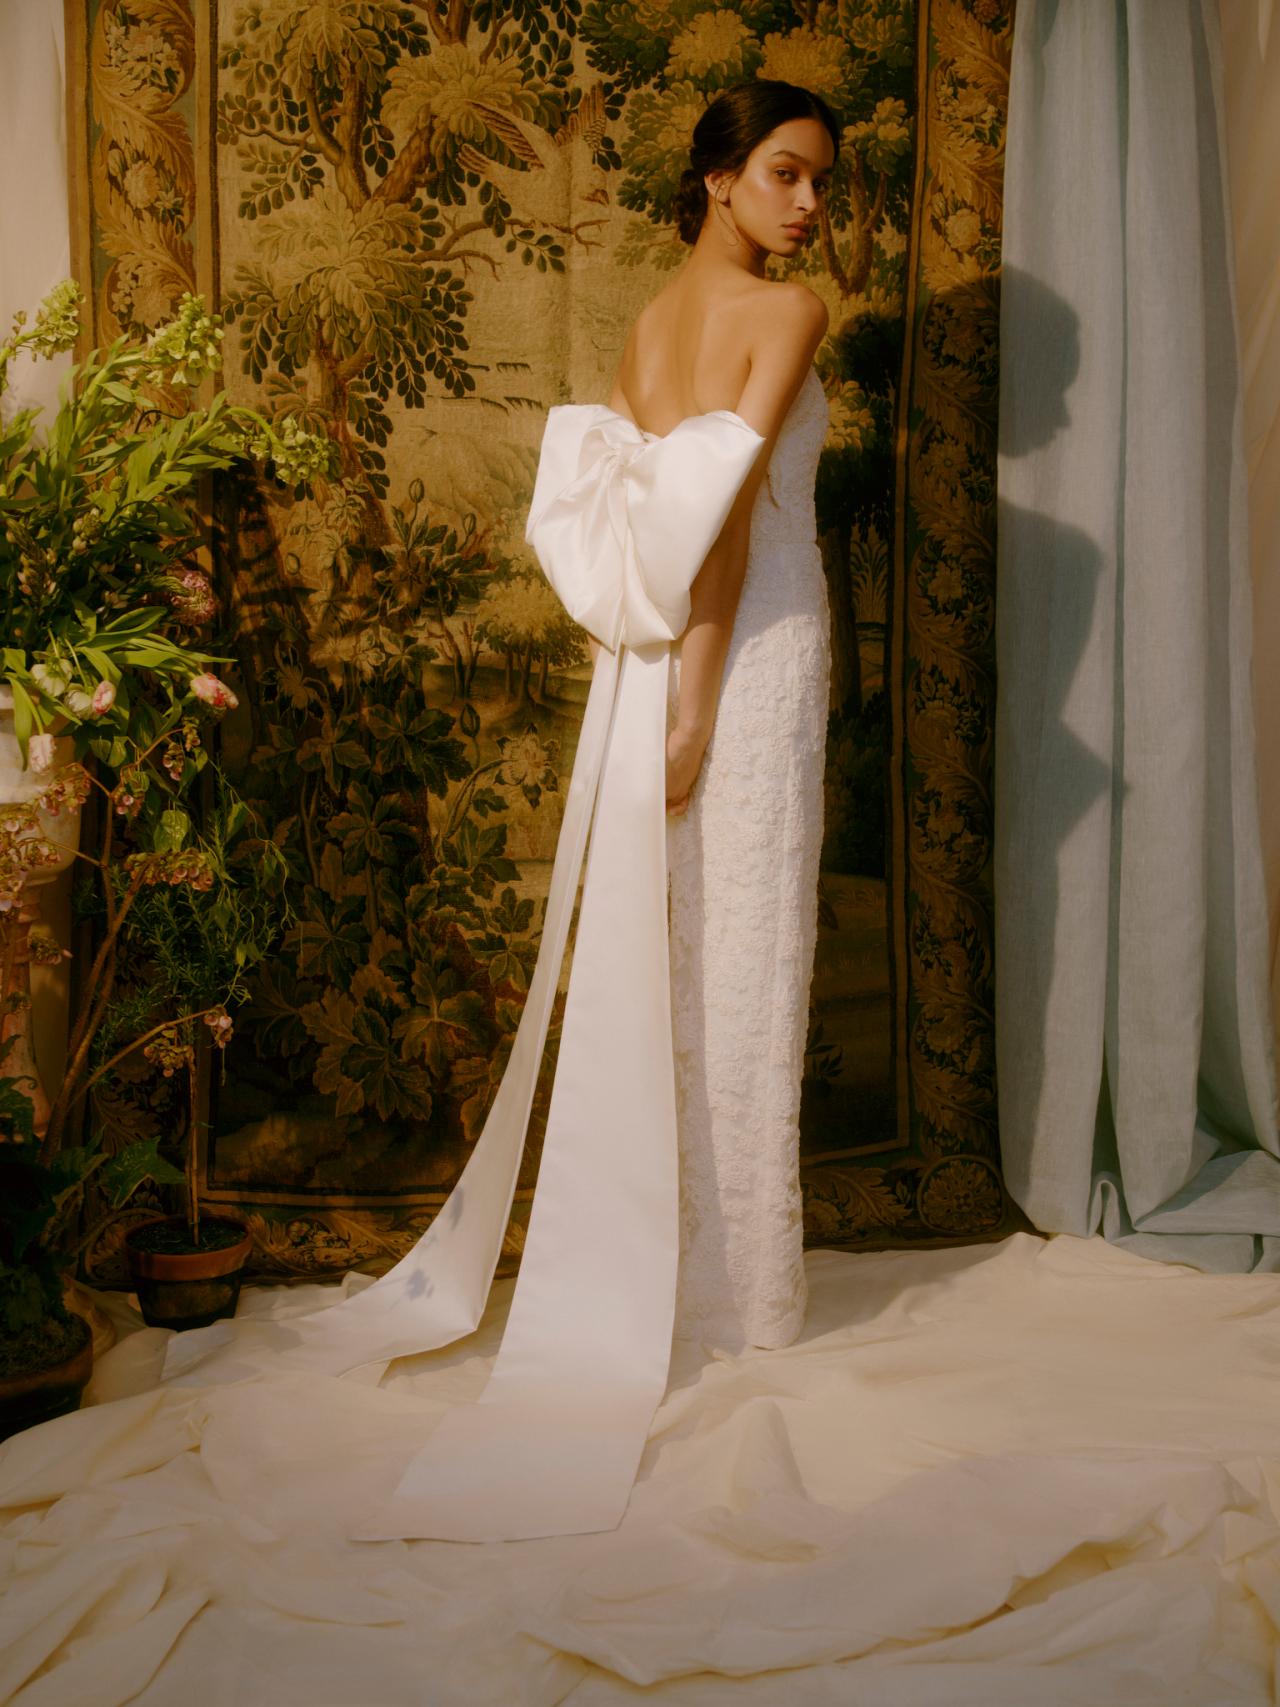 Markarian Bridal Spring 2022